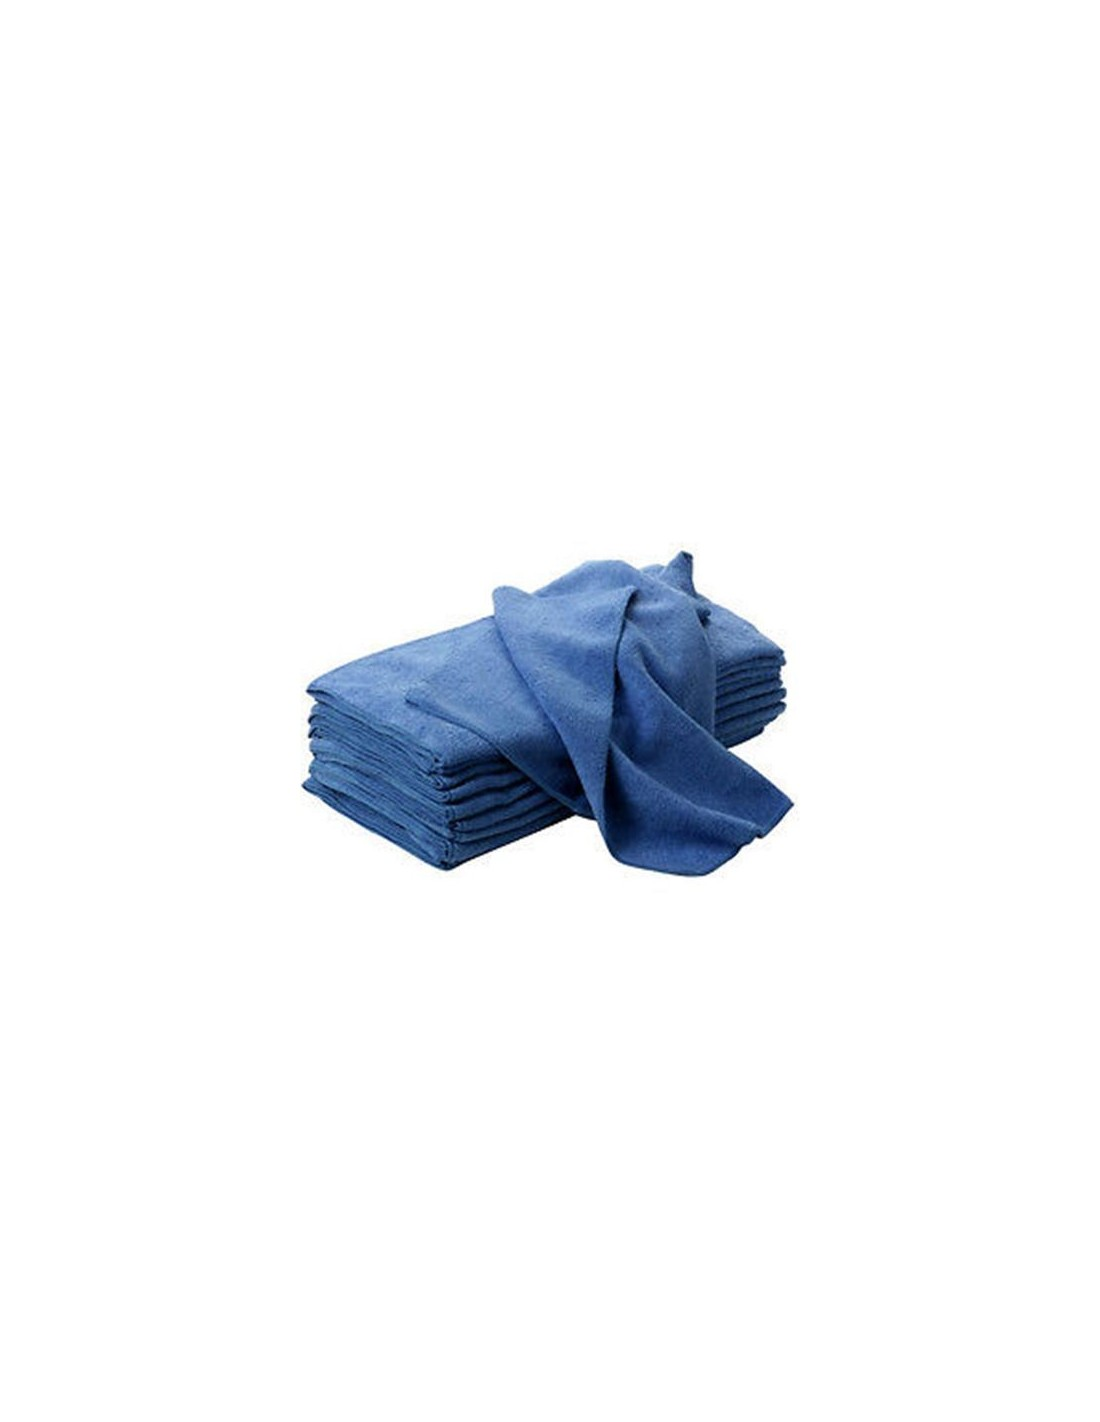 Panno Pavimenti Microfibra.12 Panni In Microfibra Pavimenti 40x60 Cf 12 Pezzi Detershoponline